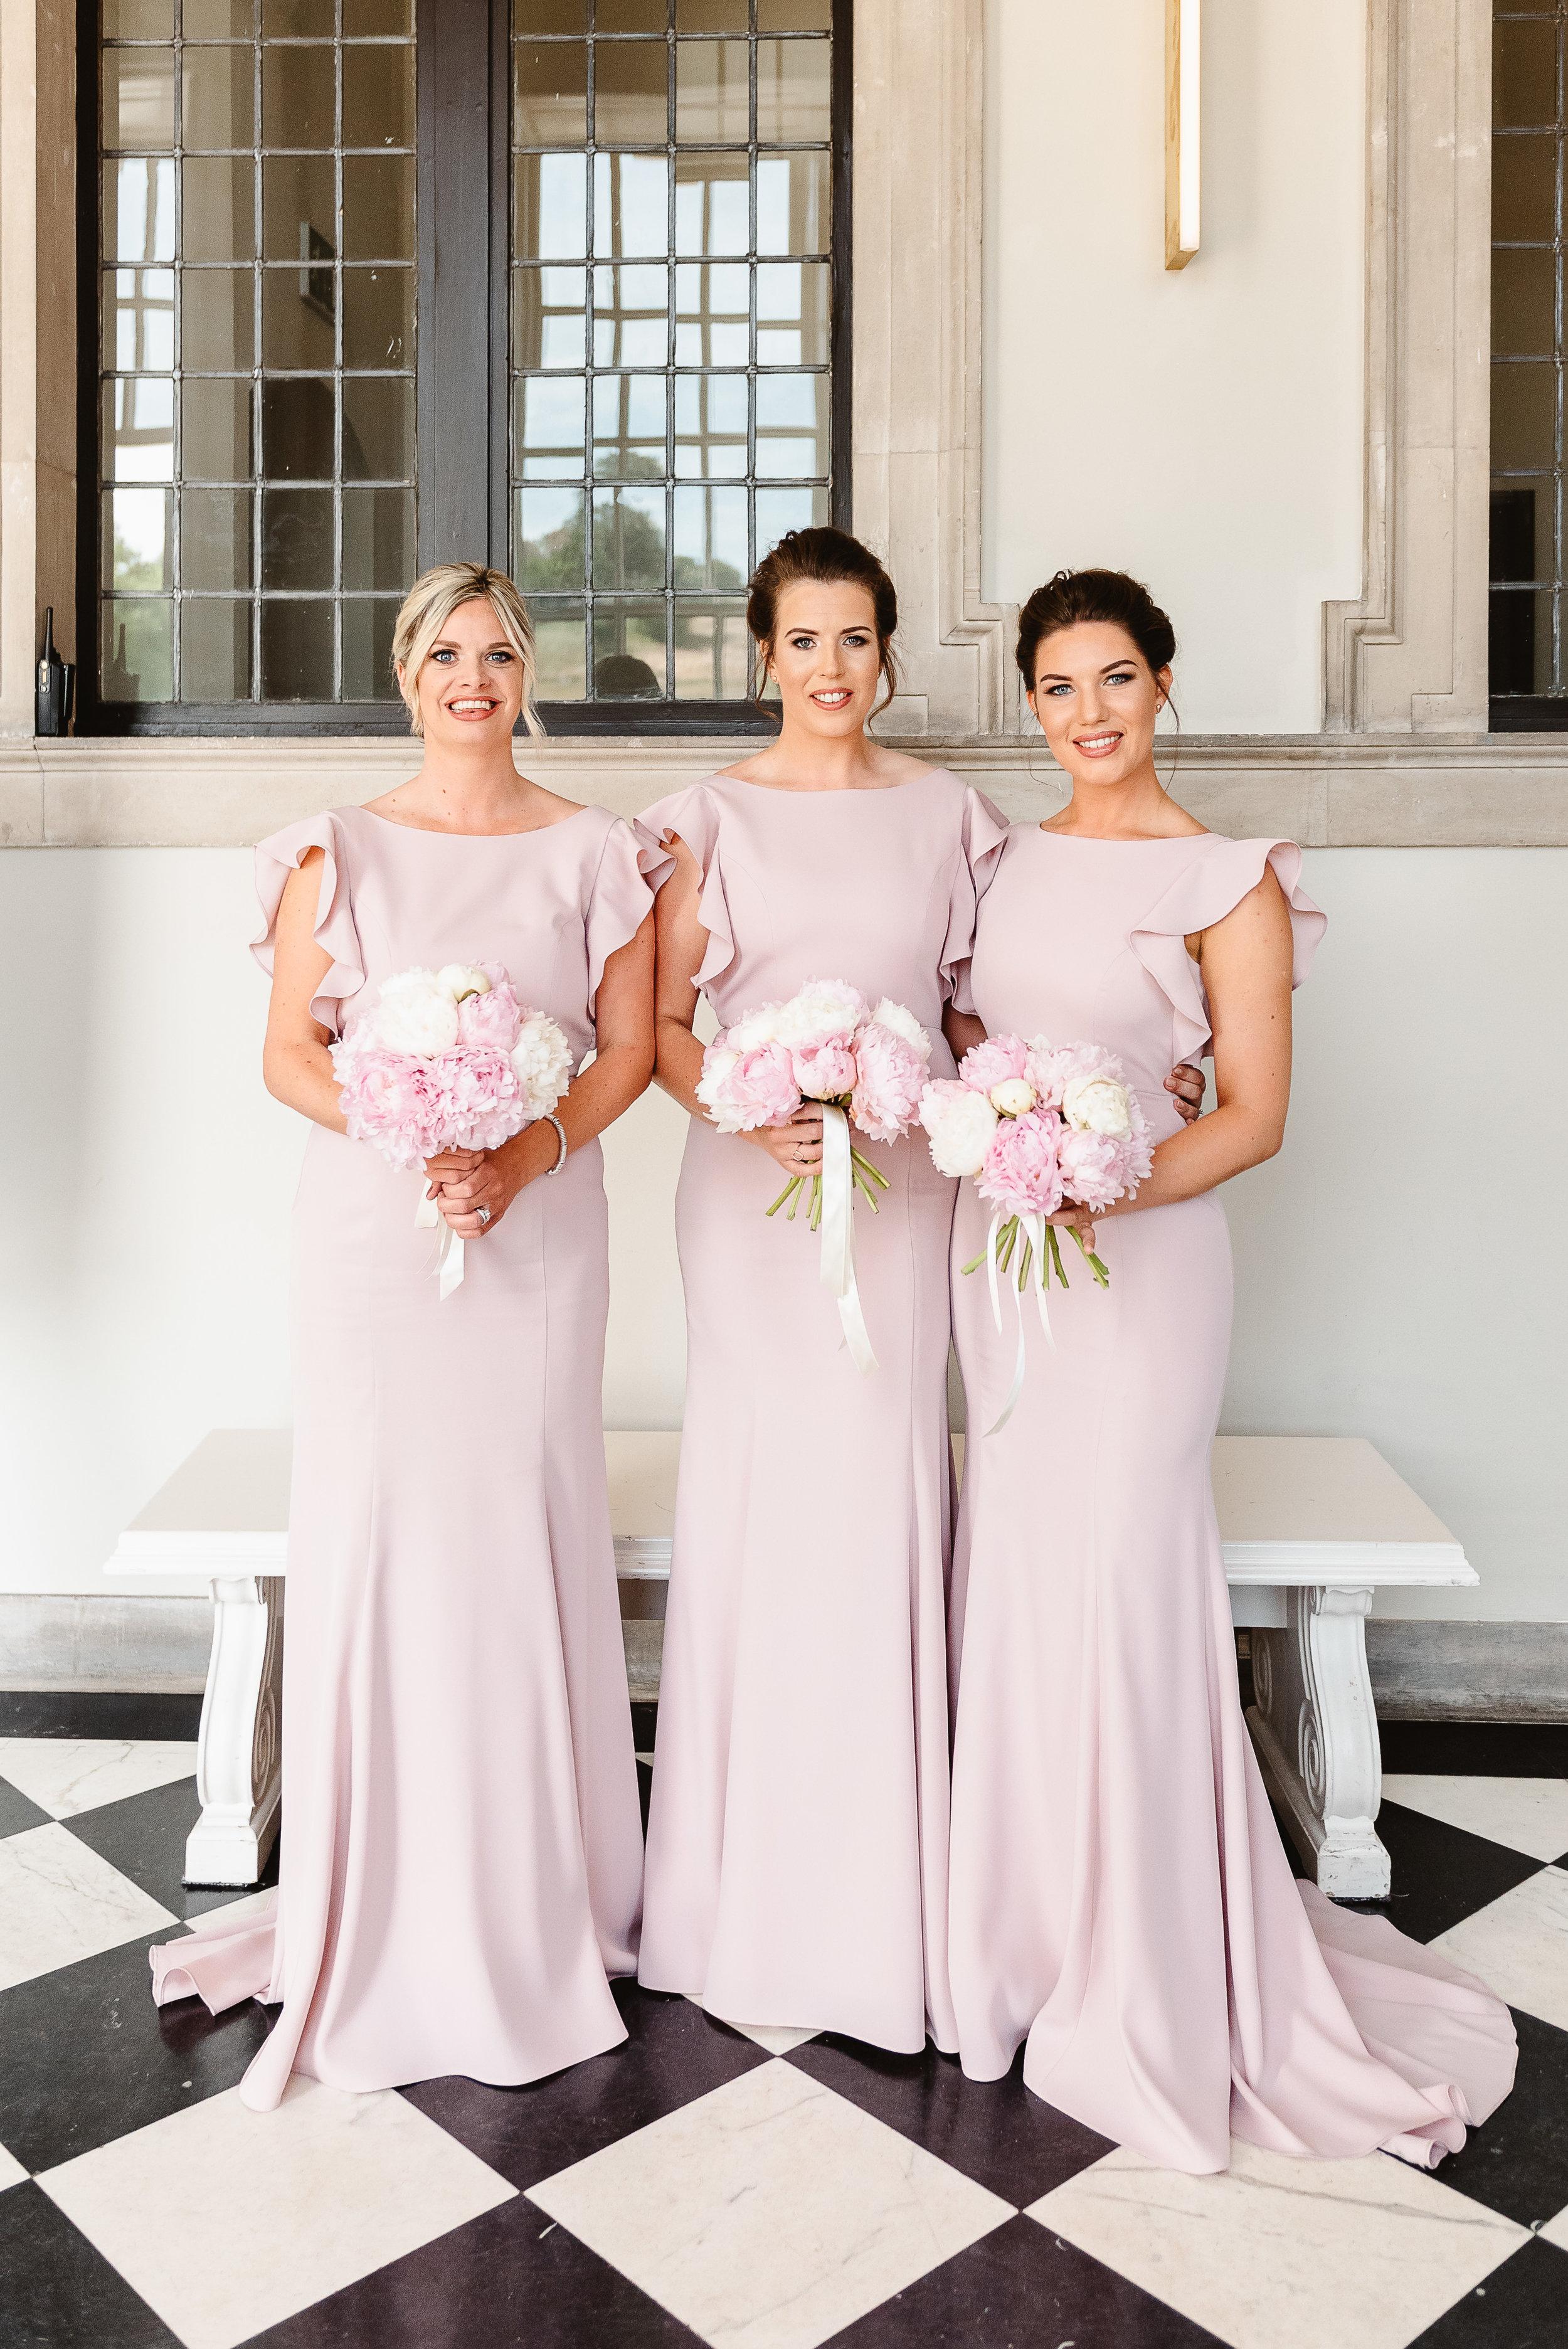 Ashlea's beautiful bridal party wearing  Cecelia in Smoked Blush  - Photo  Fiona Kelly Photography